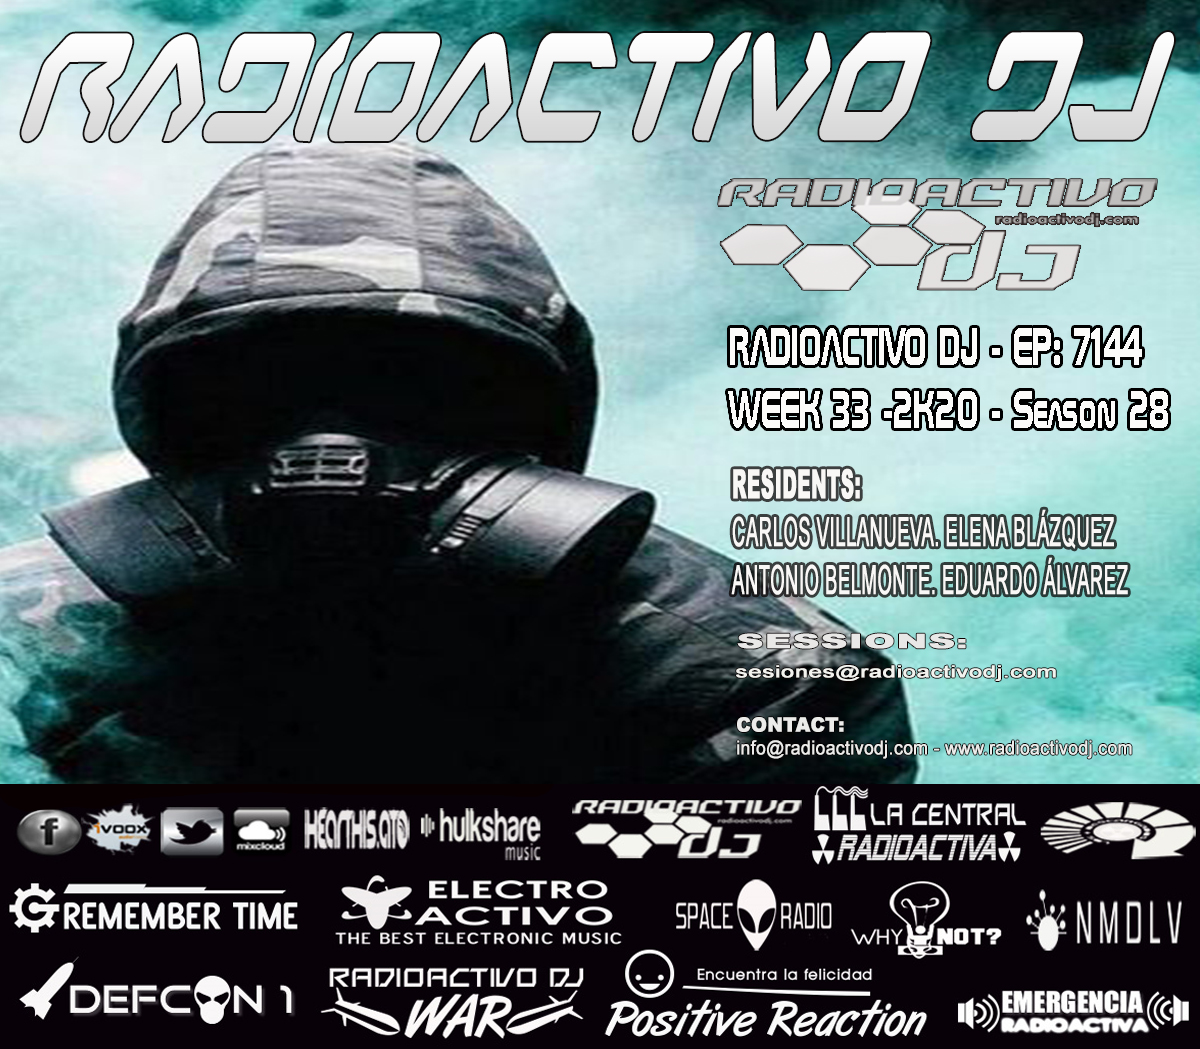 RADIOACTIVO-DJ-33-2020